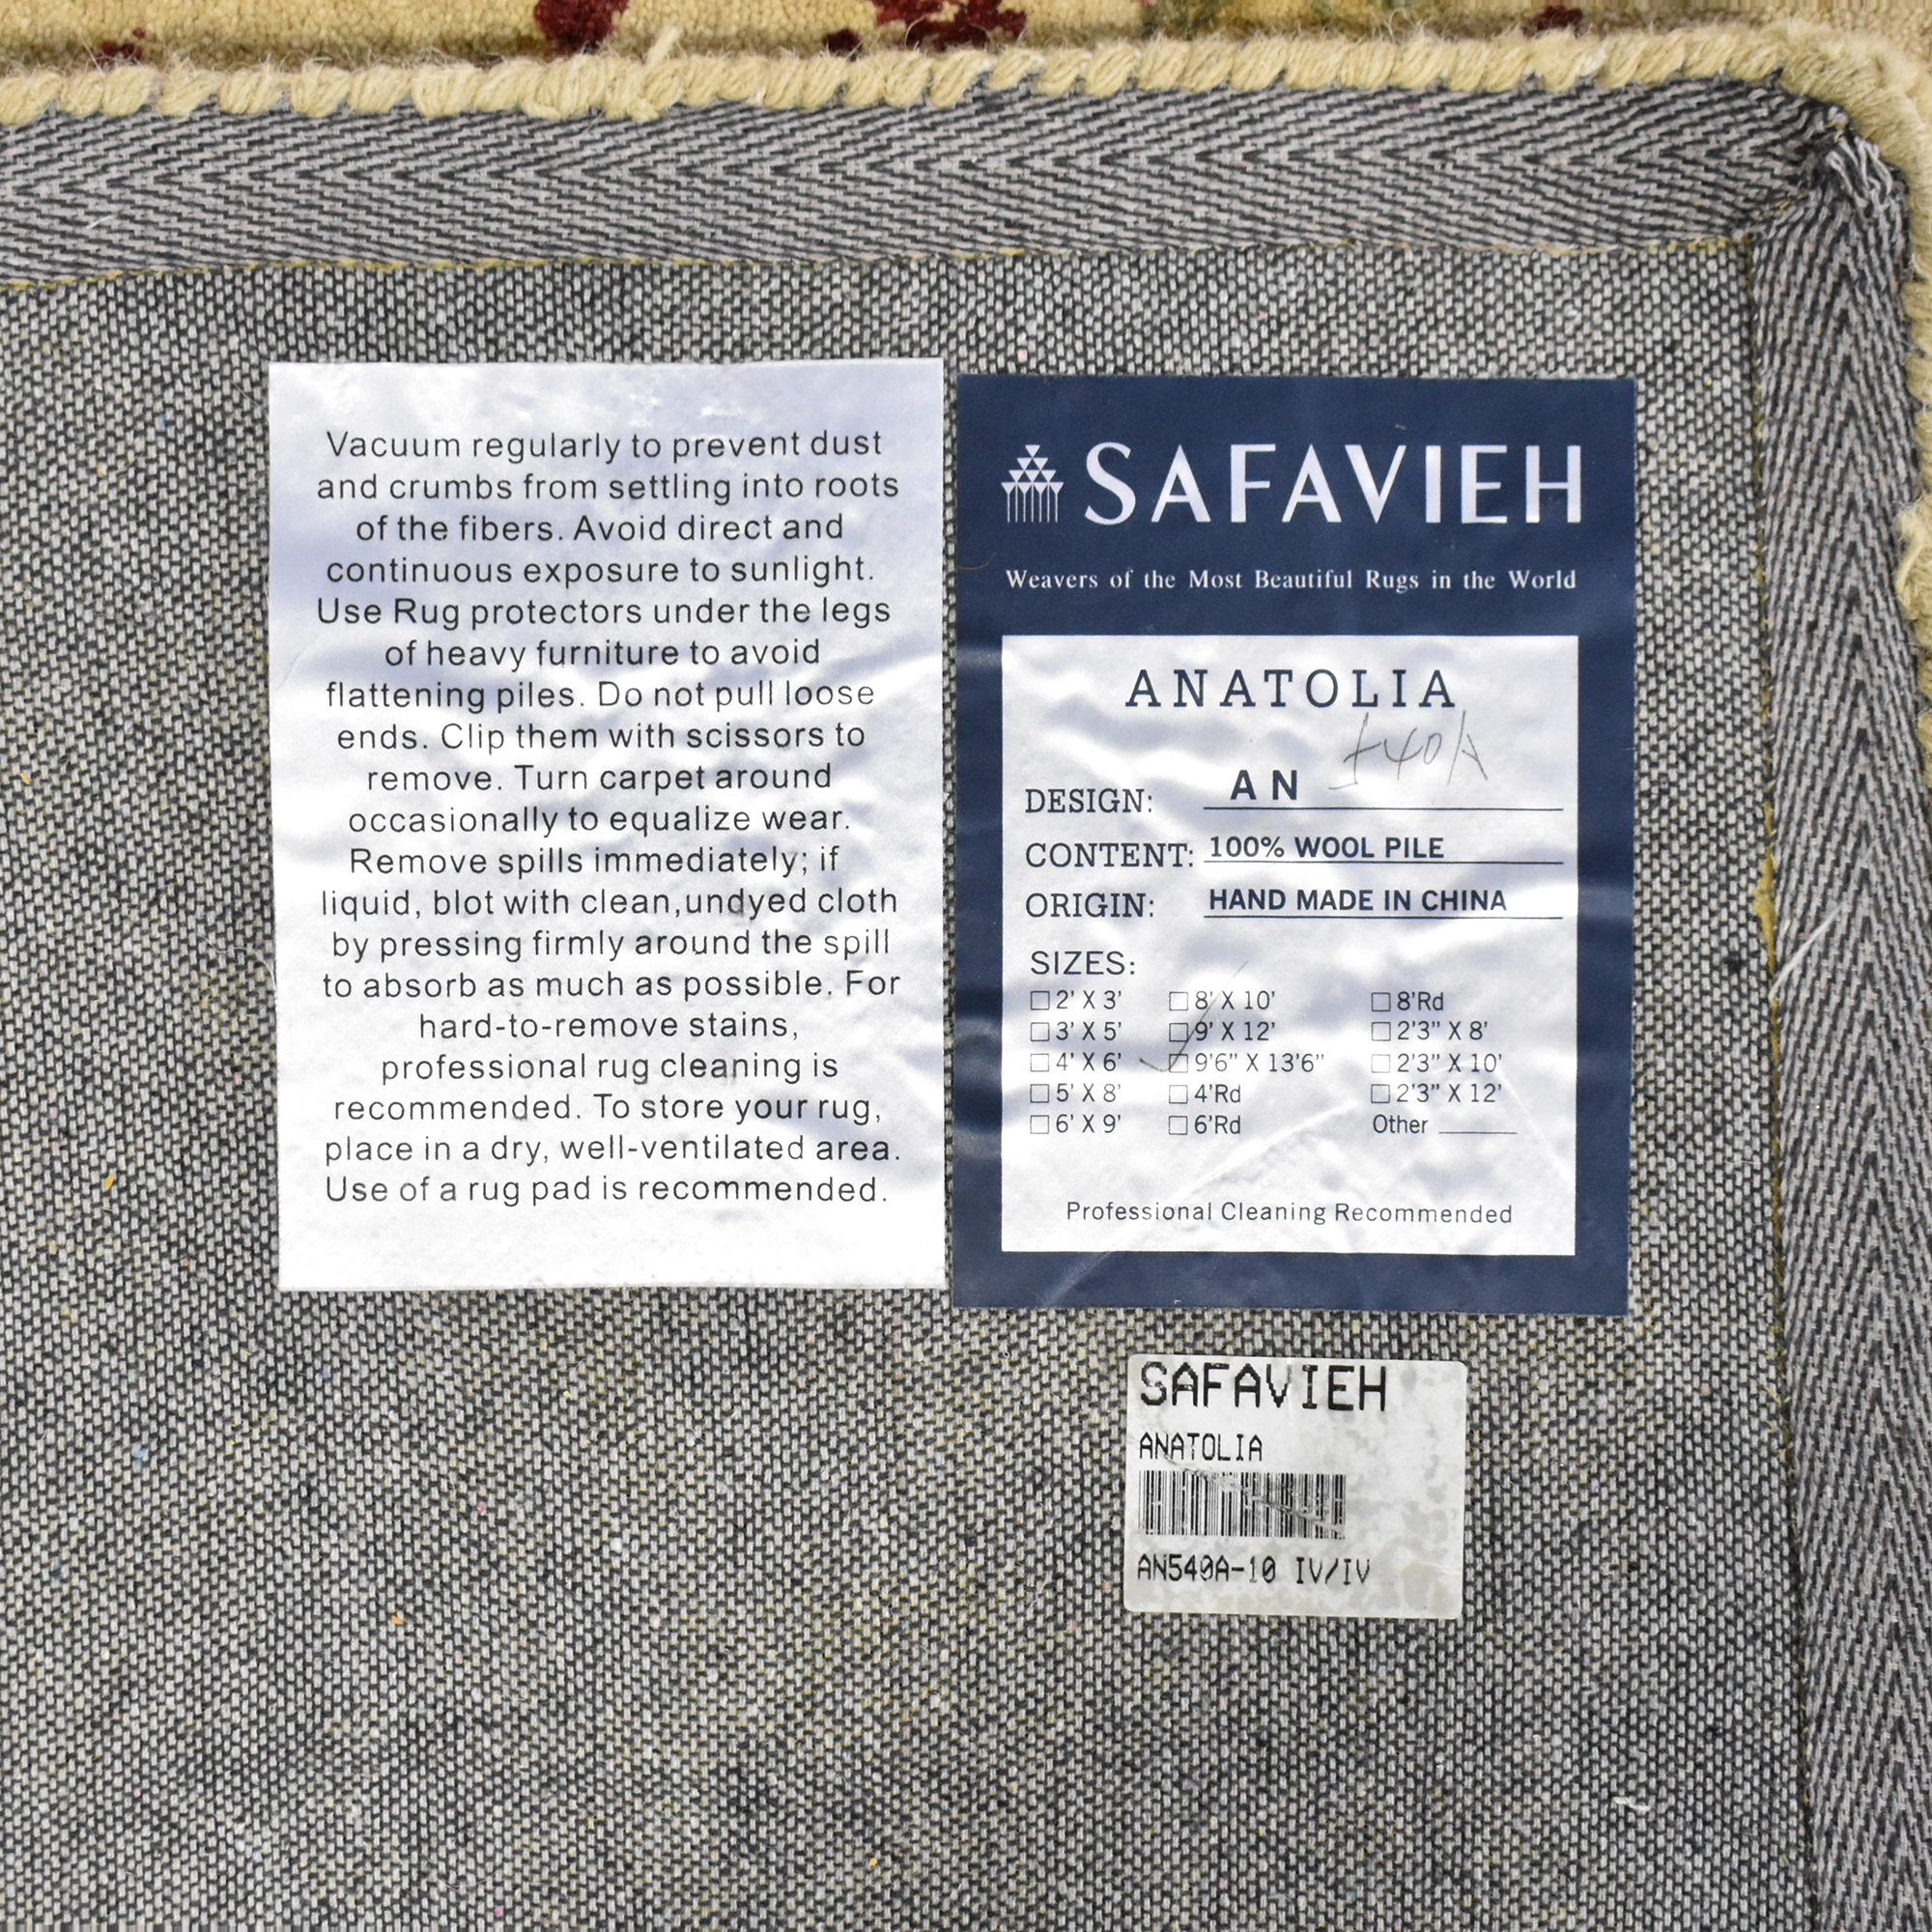 Safavieh Safavieh Anatolia Area Rug multi